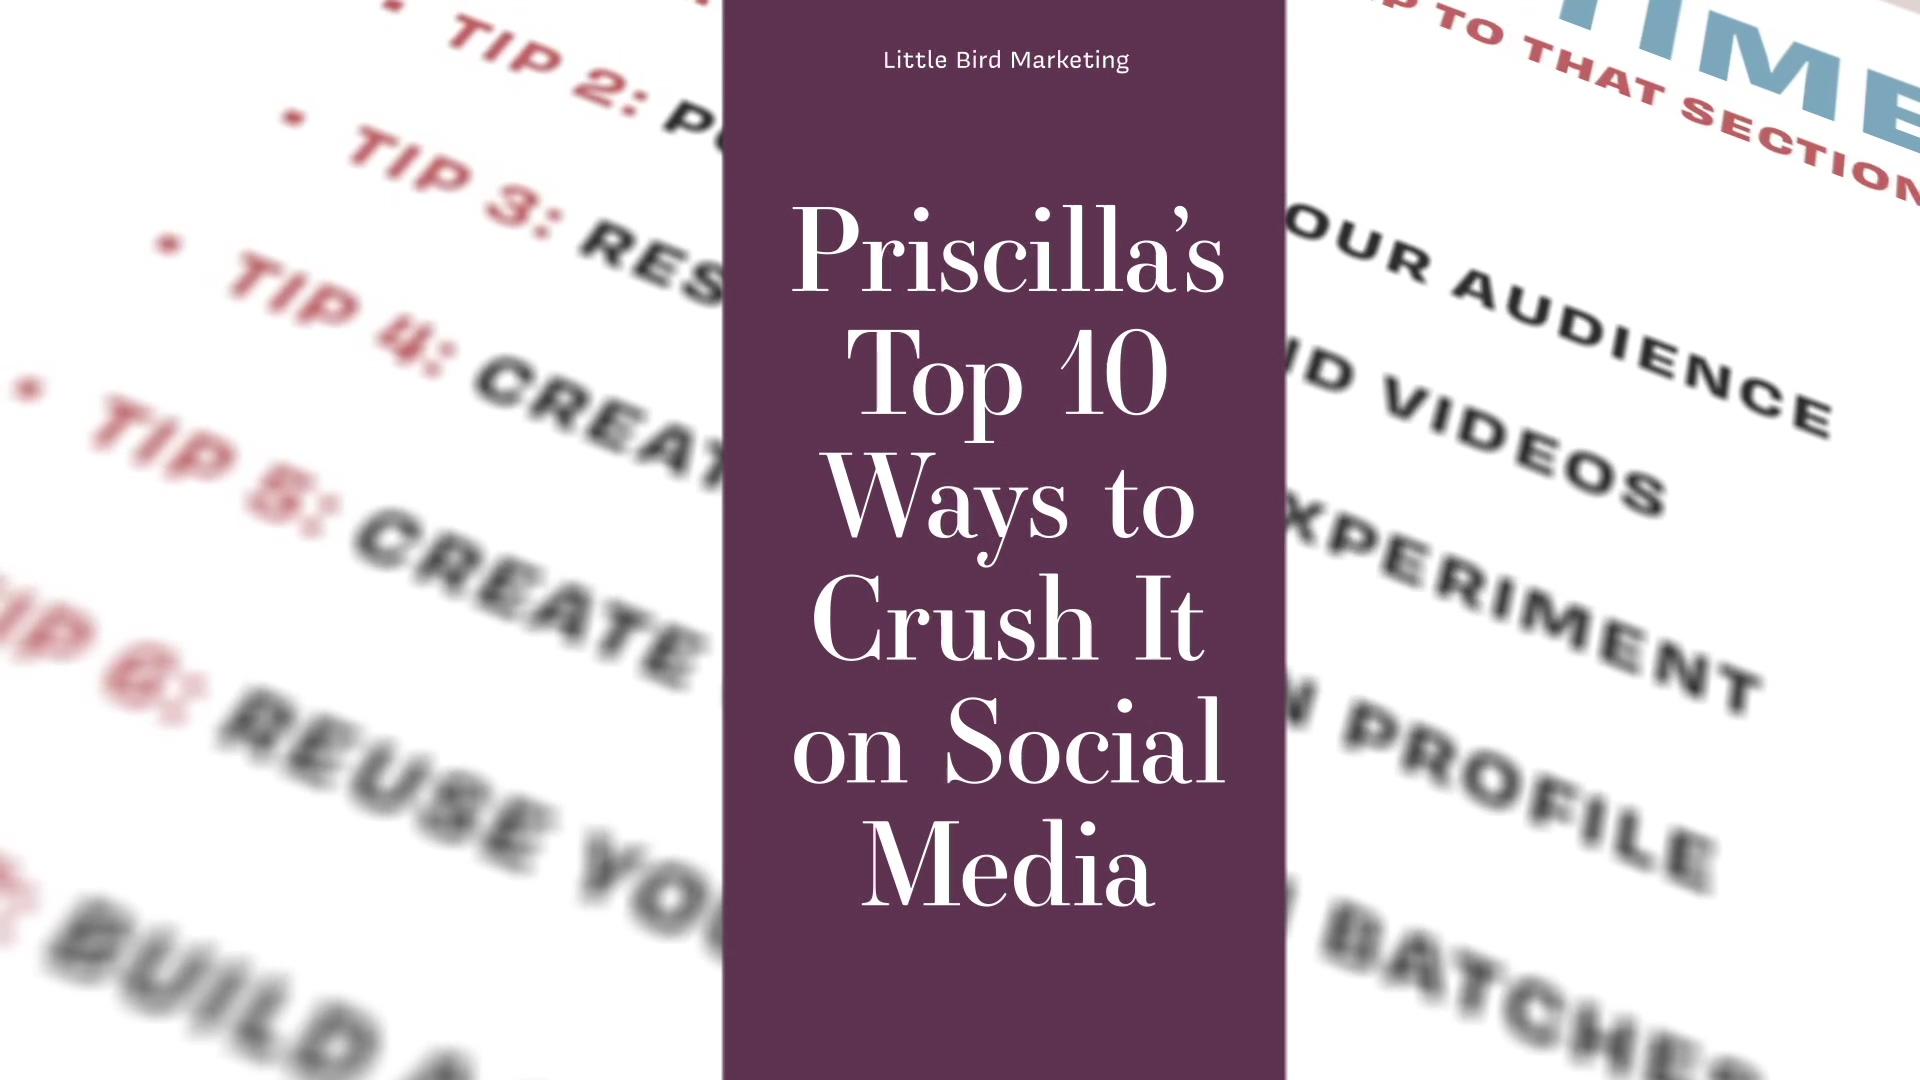 2020-lbm-priscillas-top-10-ways-to-crush-it-on-social-media